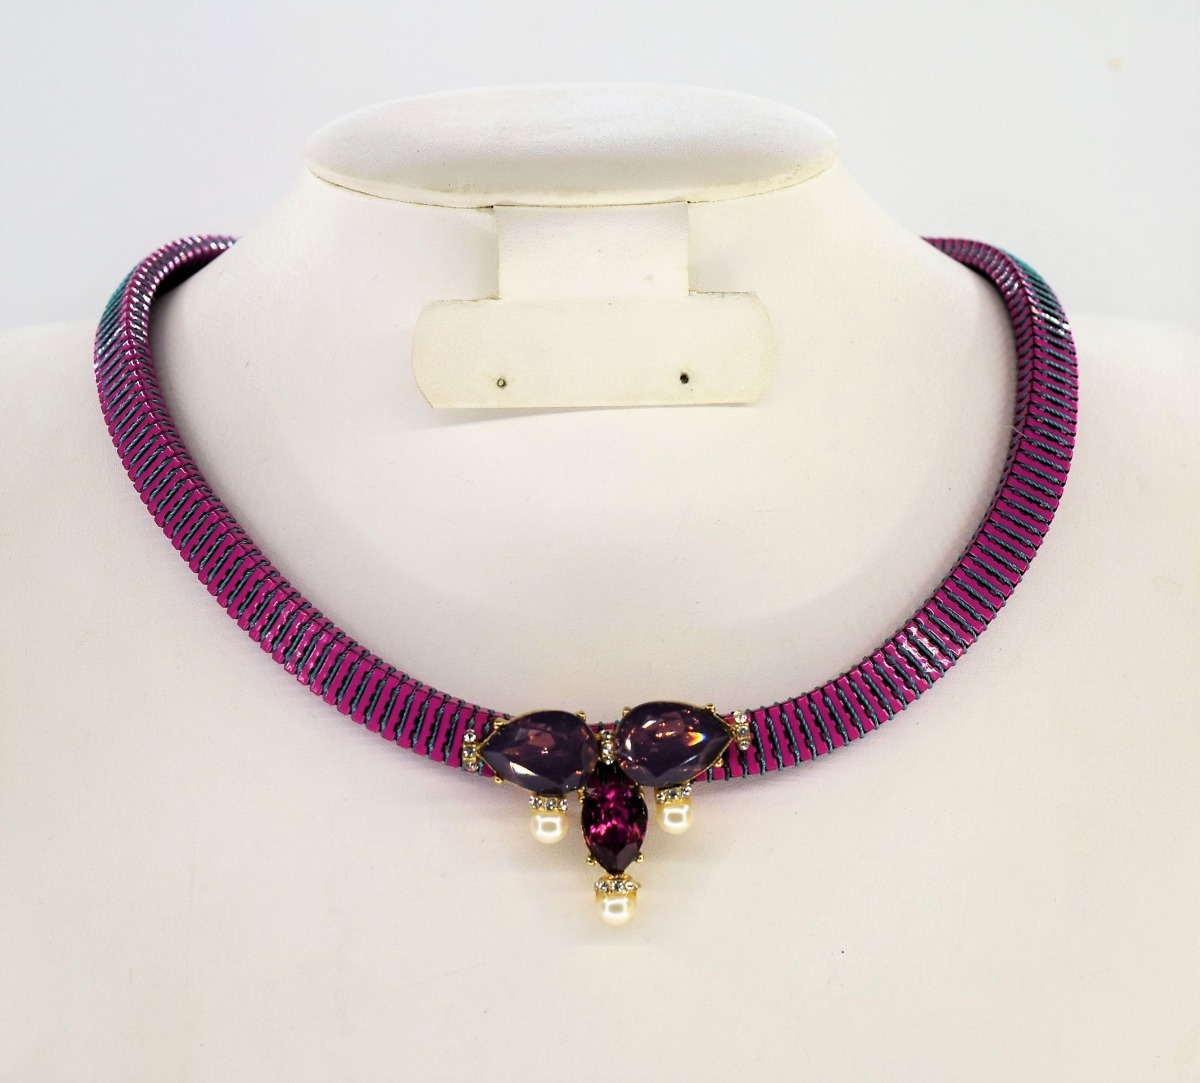 795dc9009a56 collar hermoso para dama metálico dije de piedra sintética. Cargando zoom.